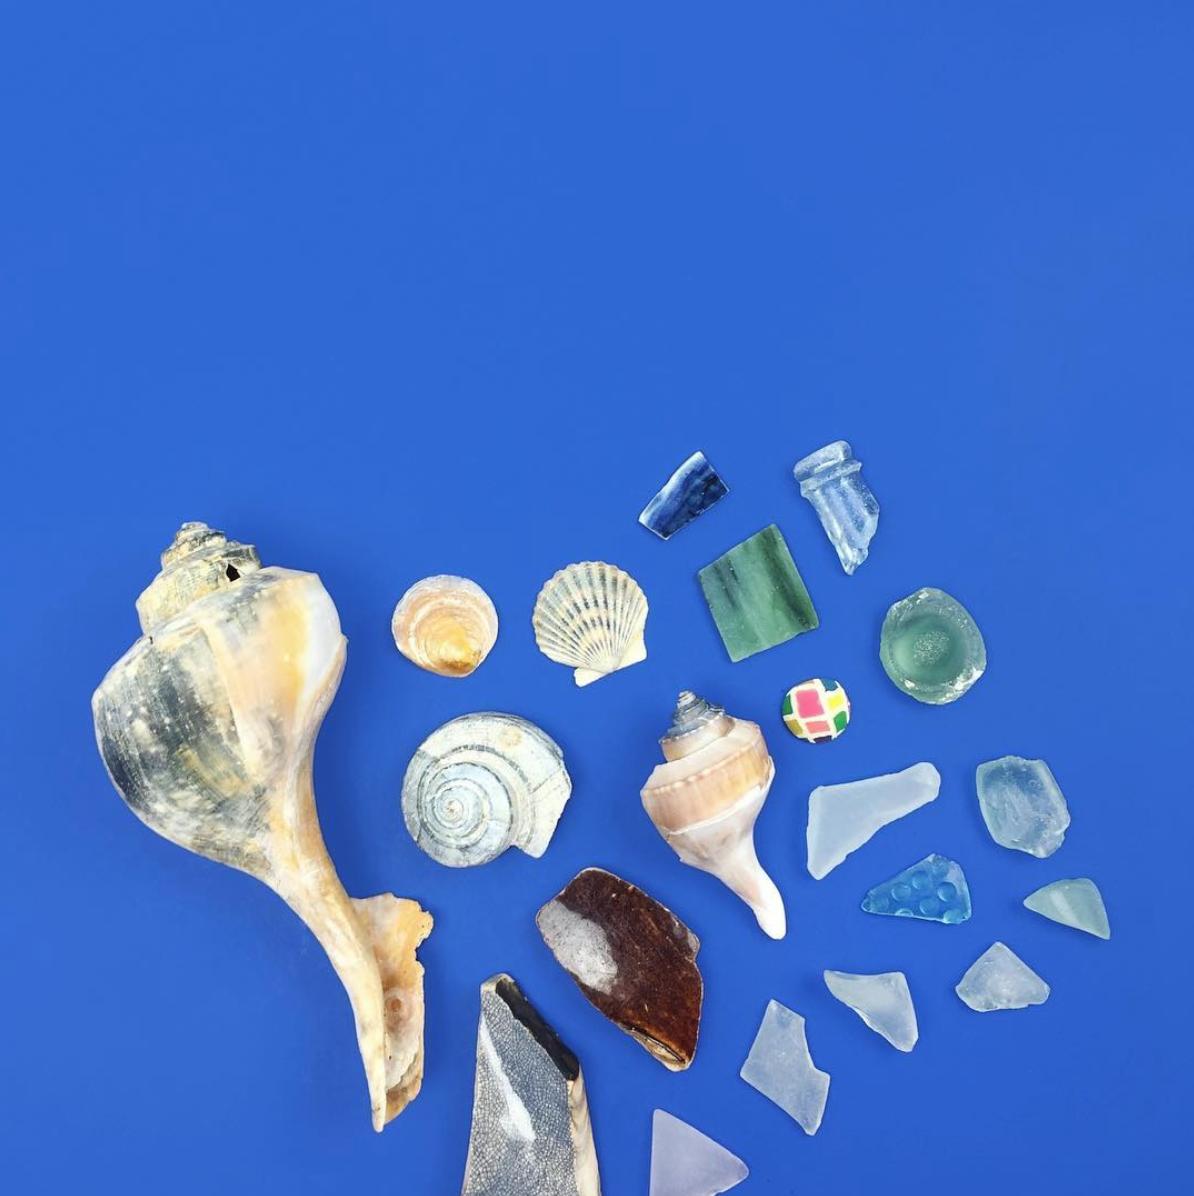 amy_chen_design_coney_island_beach_combing_finds_seaglass_seashells